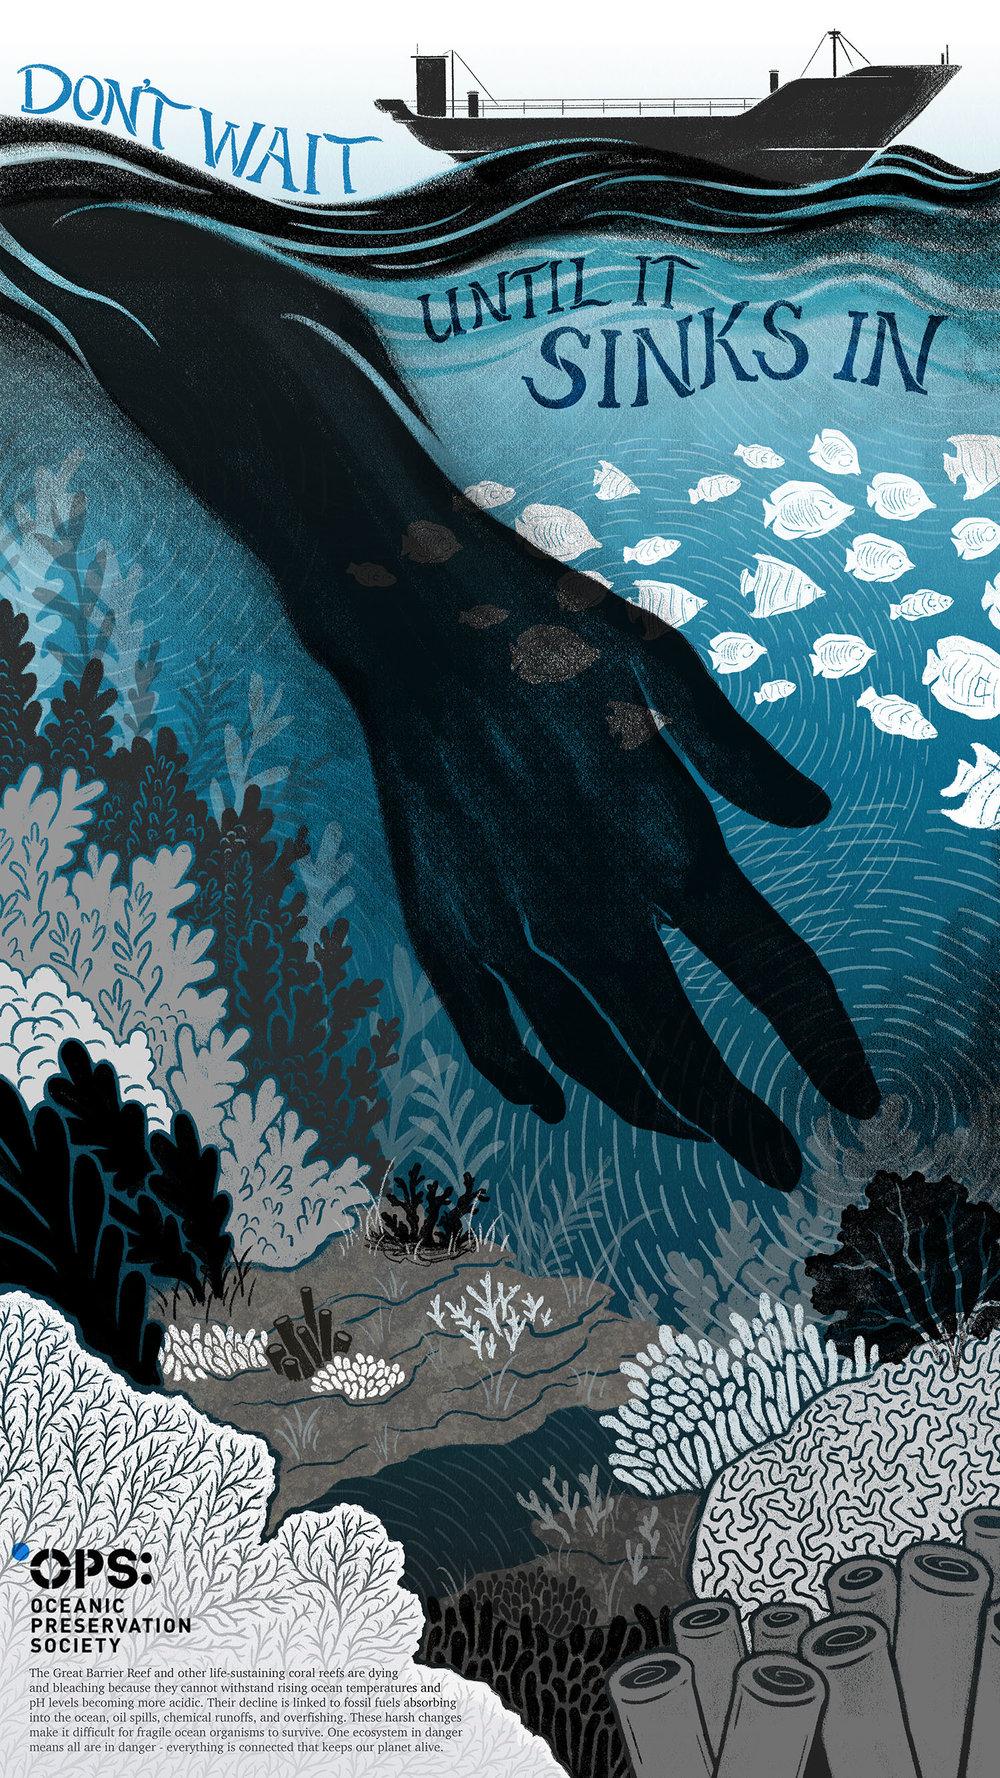 The Human Effect: Environmental Awareness Poster Series (3)